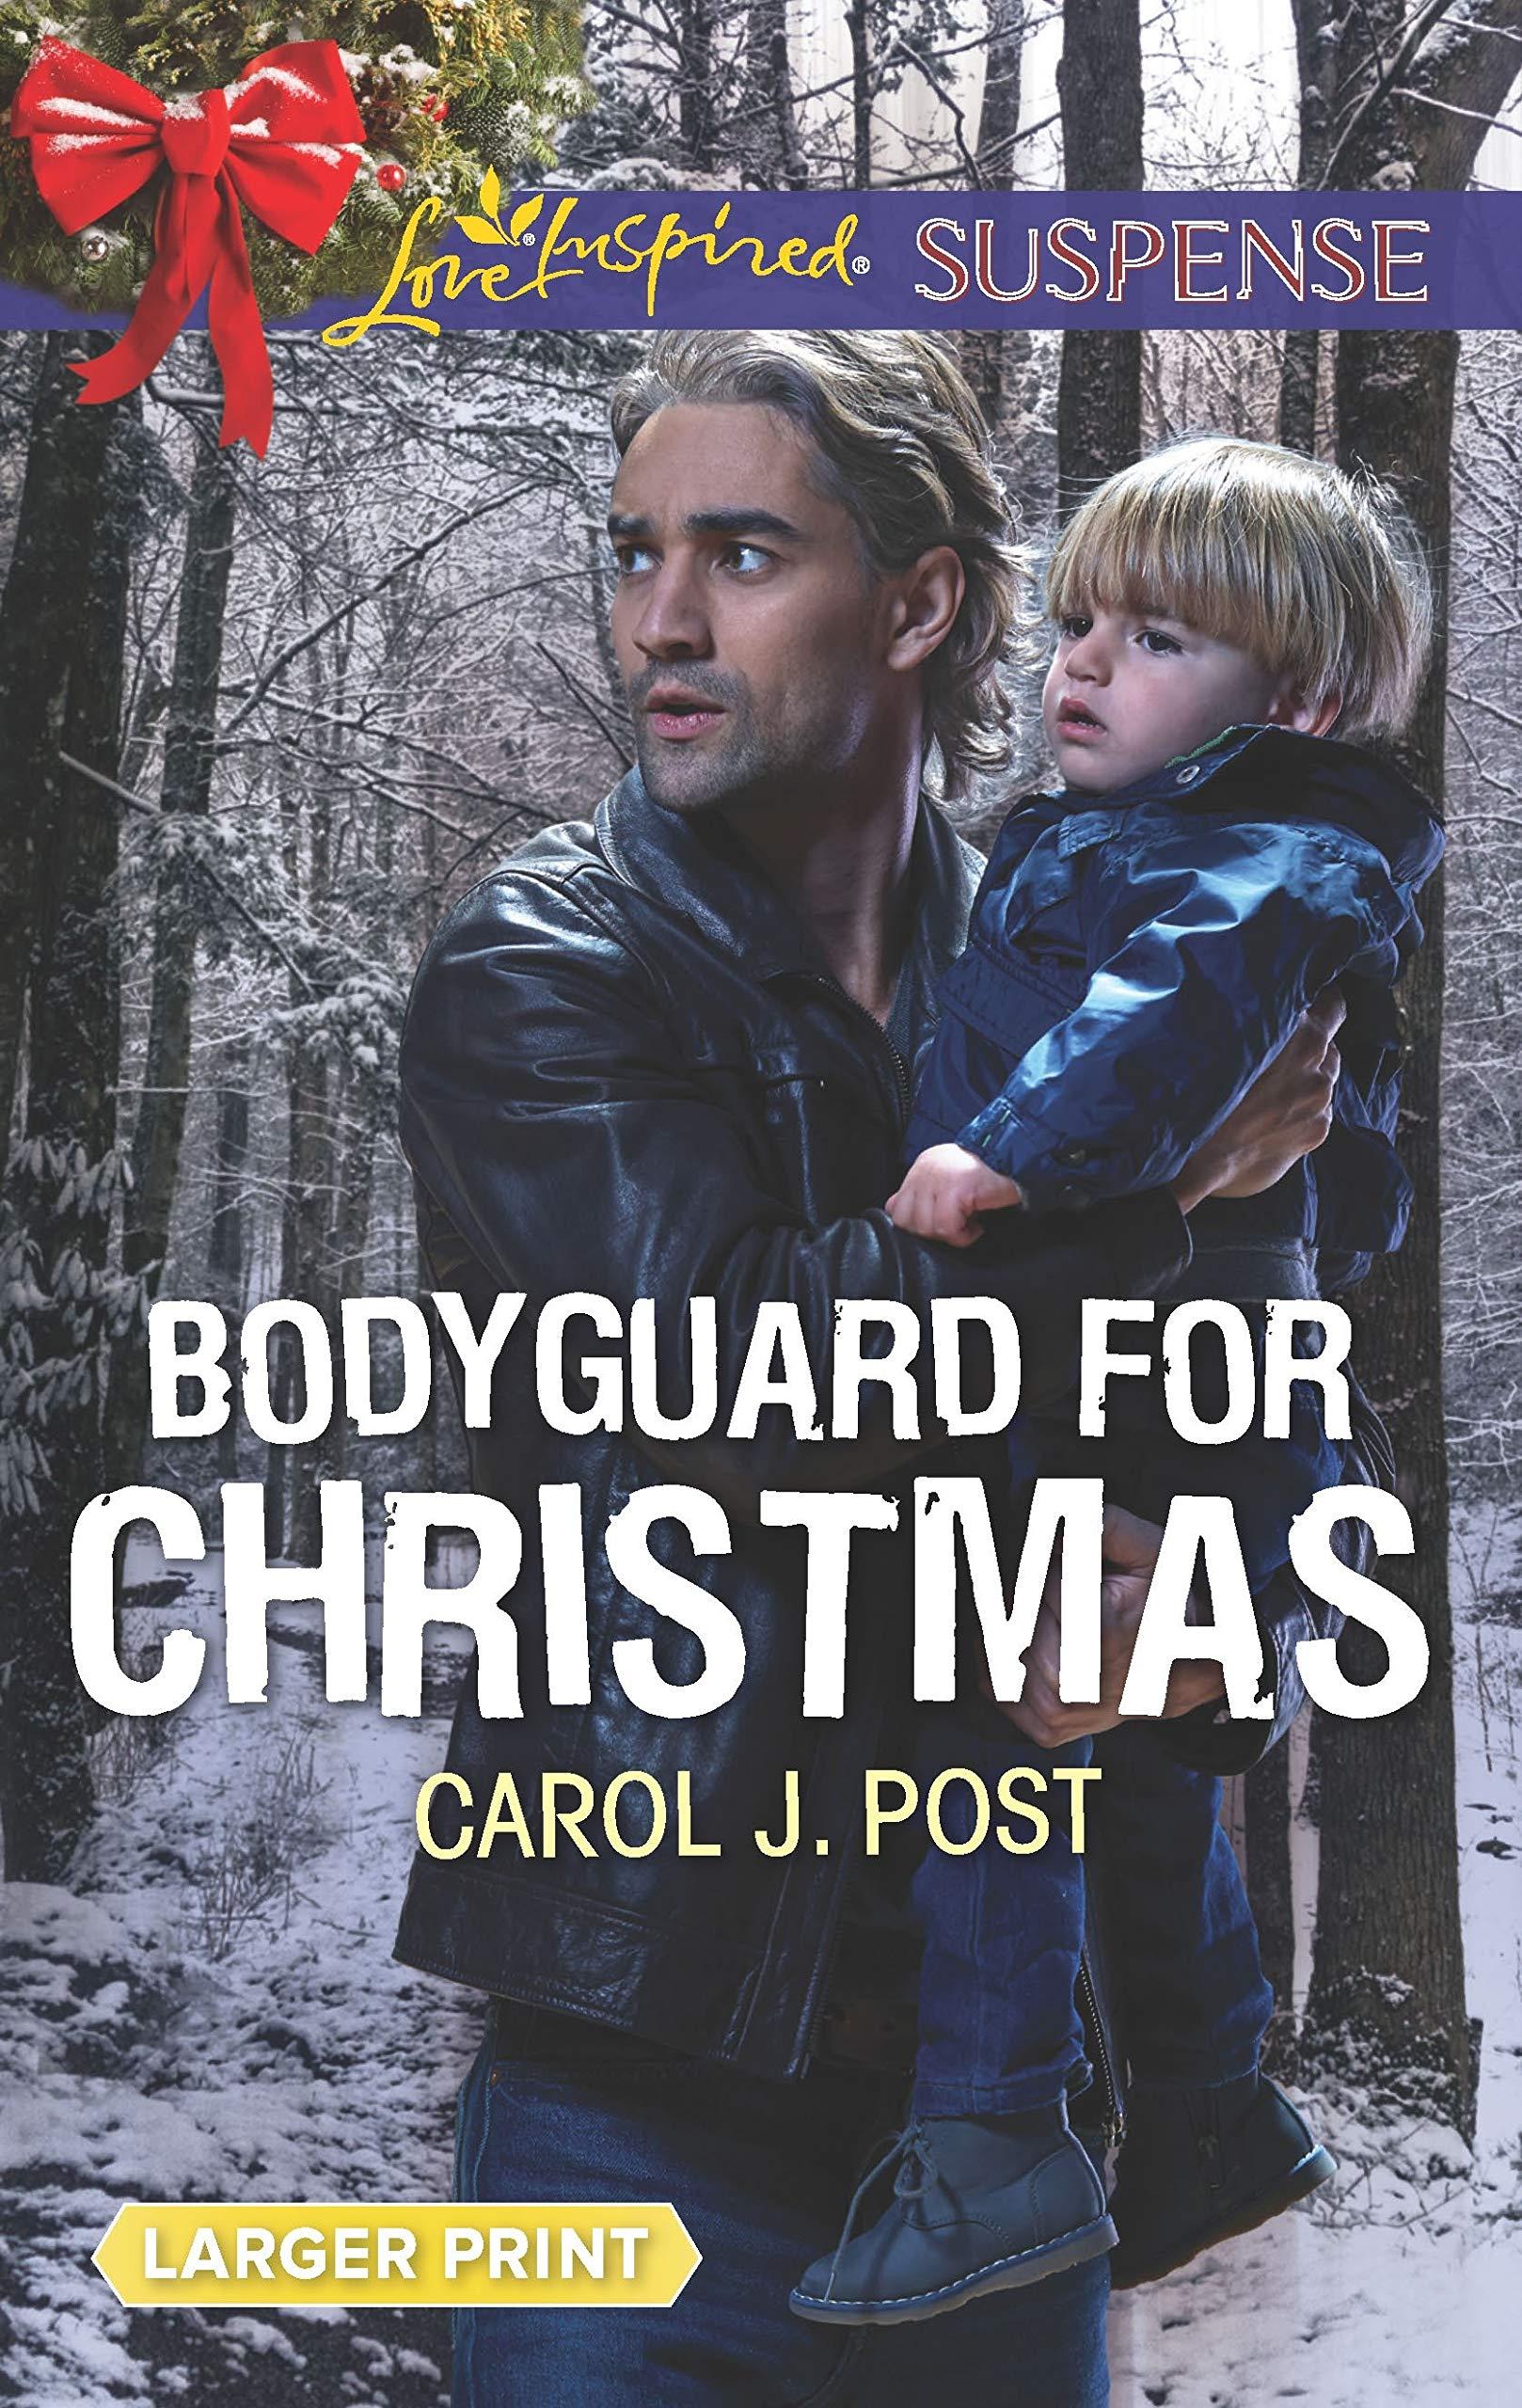 Image result for bodyguard for christmas carol j post